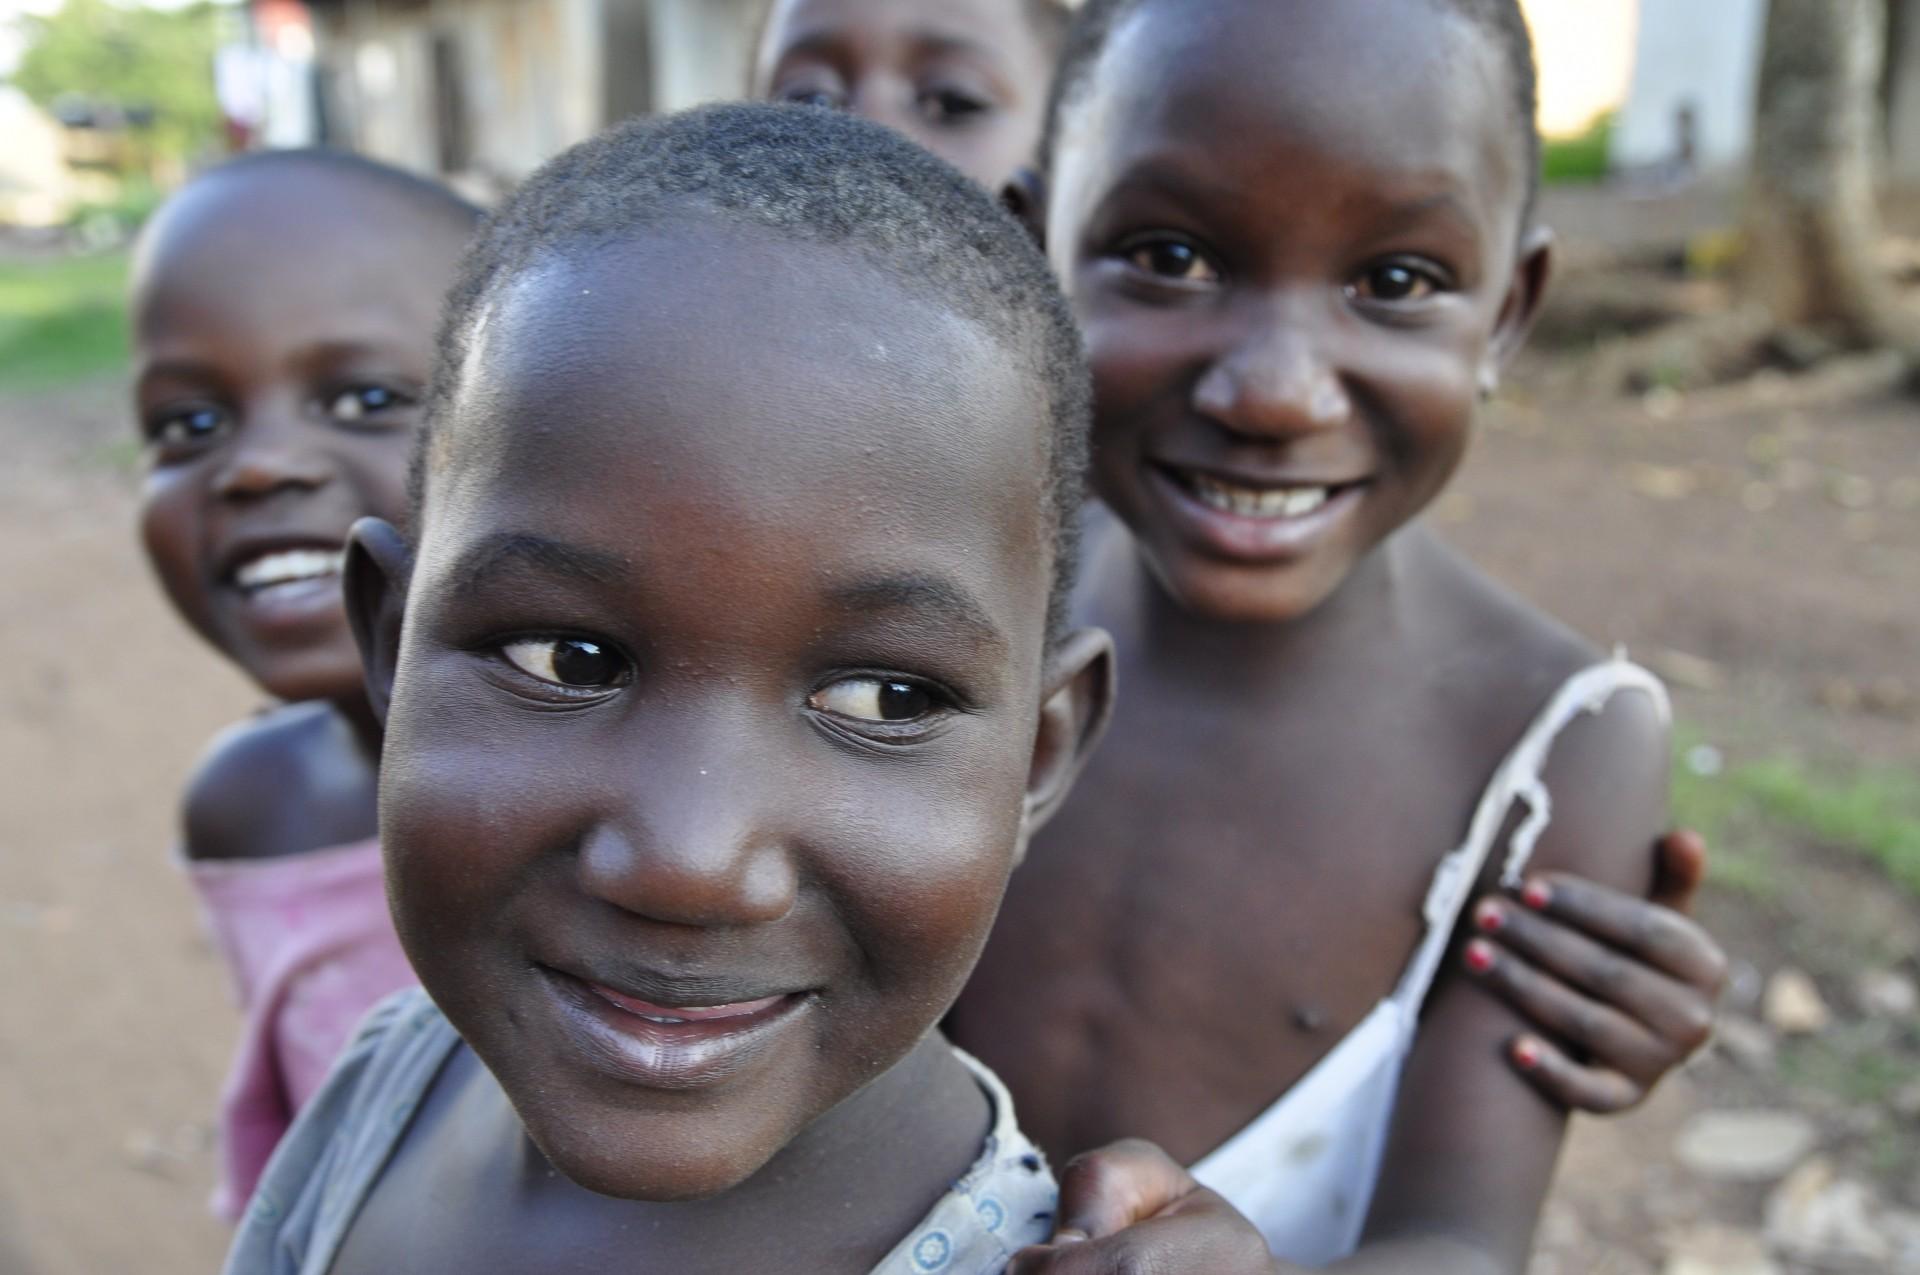 Children-in-the-Kiwoko-community.jpg